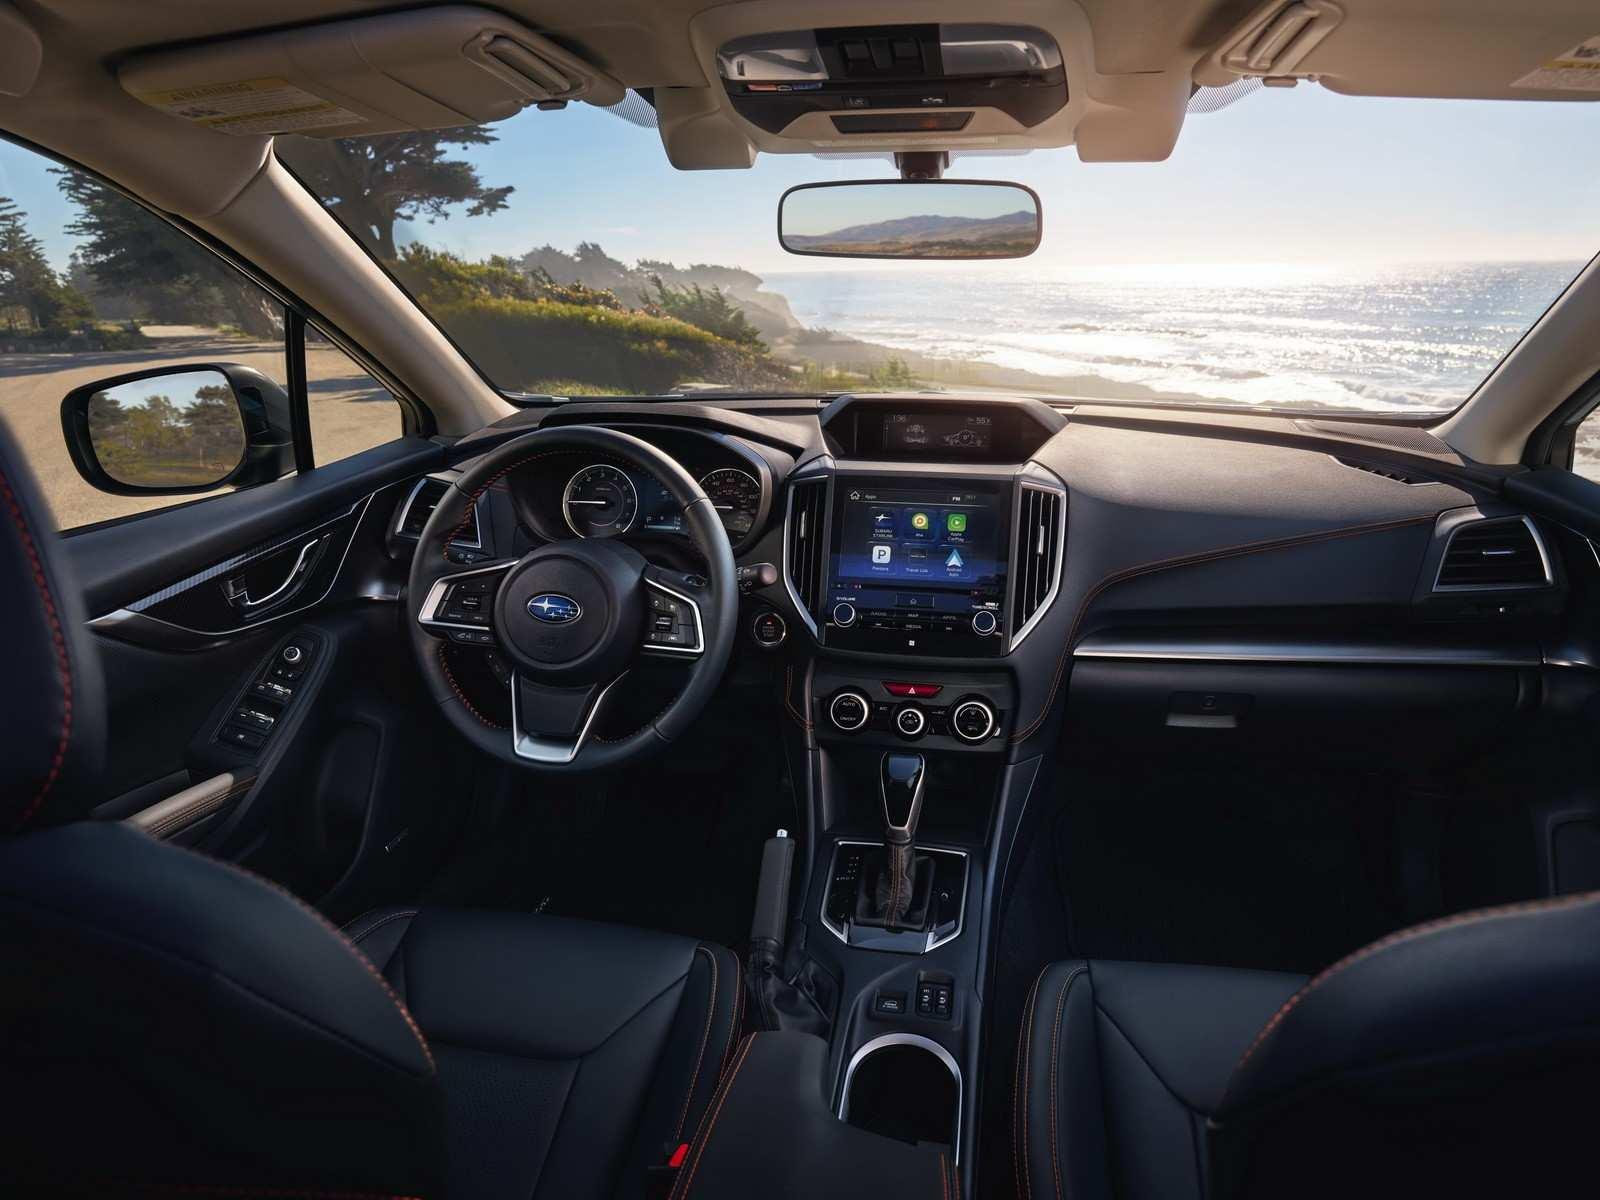 86 New 2019 Subaru Hybrid History with 2019 Subaru Hybrid